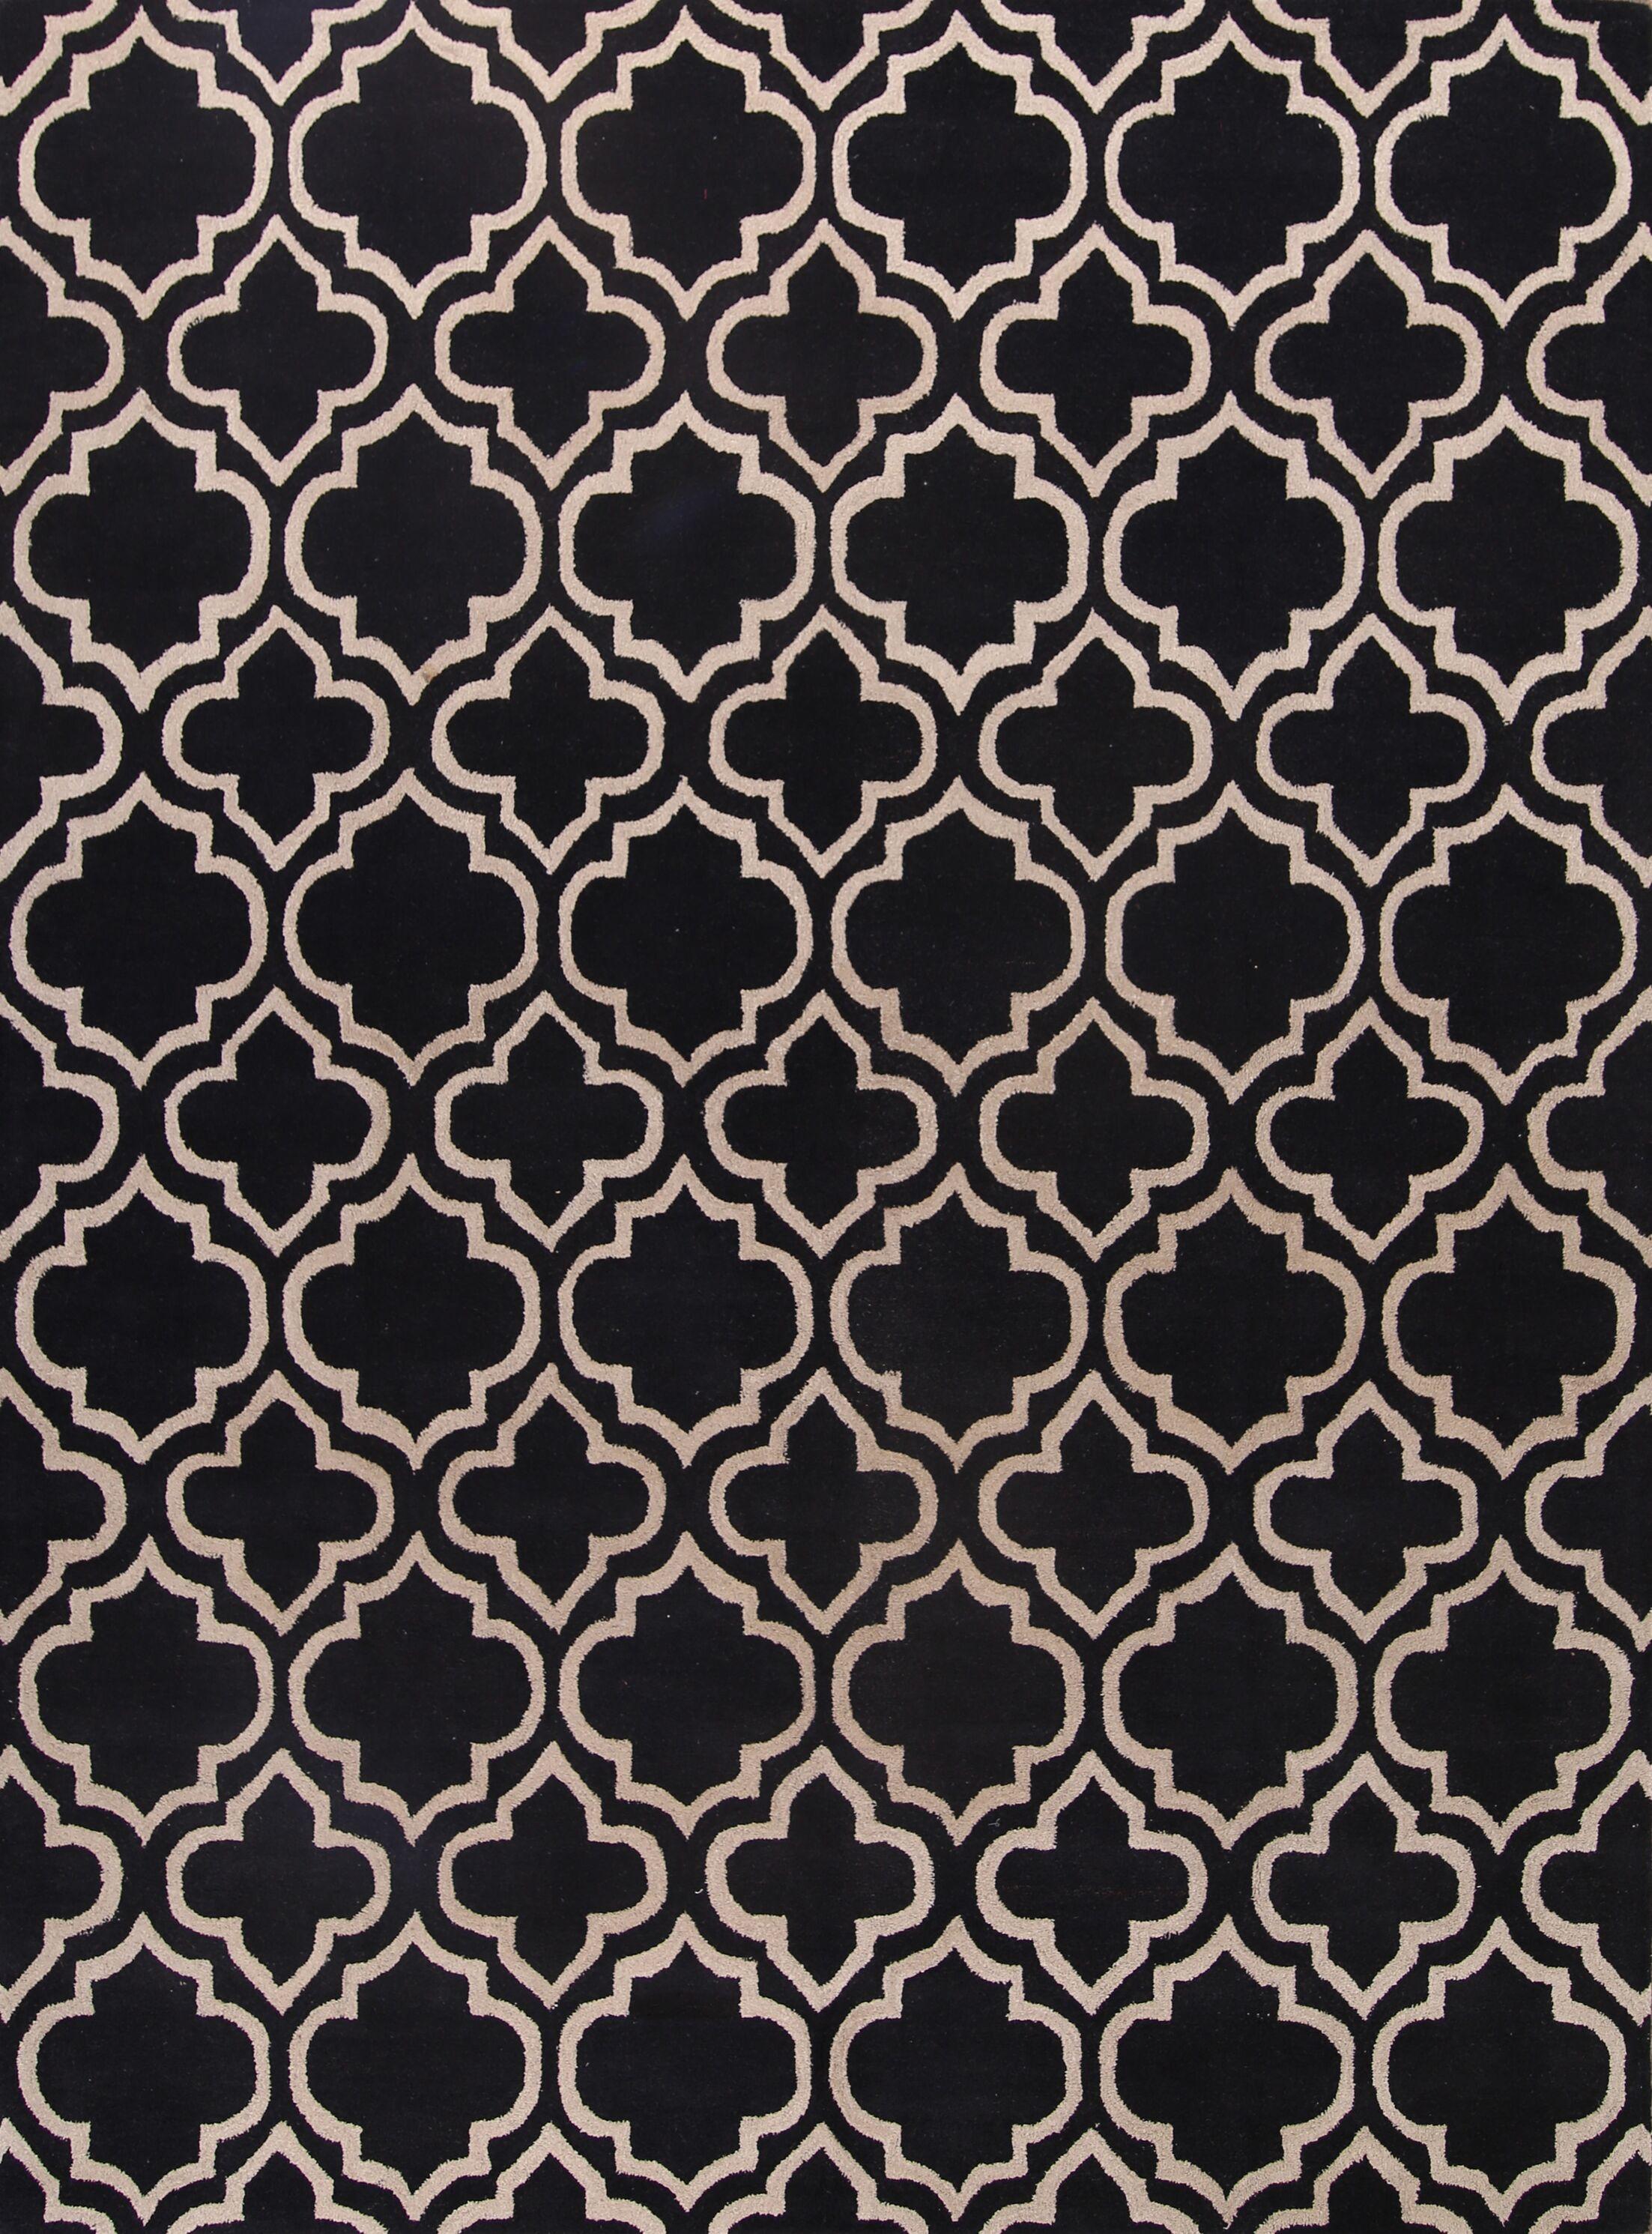 Pryor Traditional Moroccan Trellis Oriental Hand-Tufted Wool Black/White Area Rug